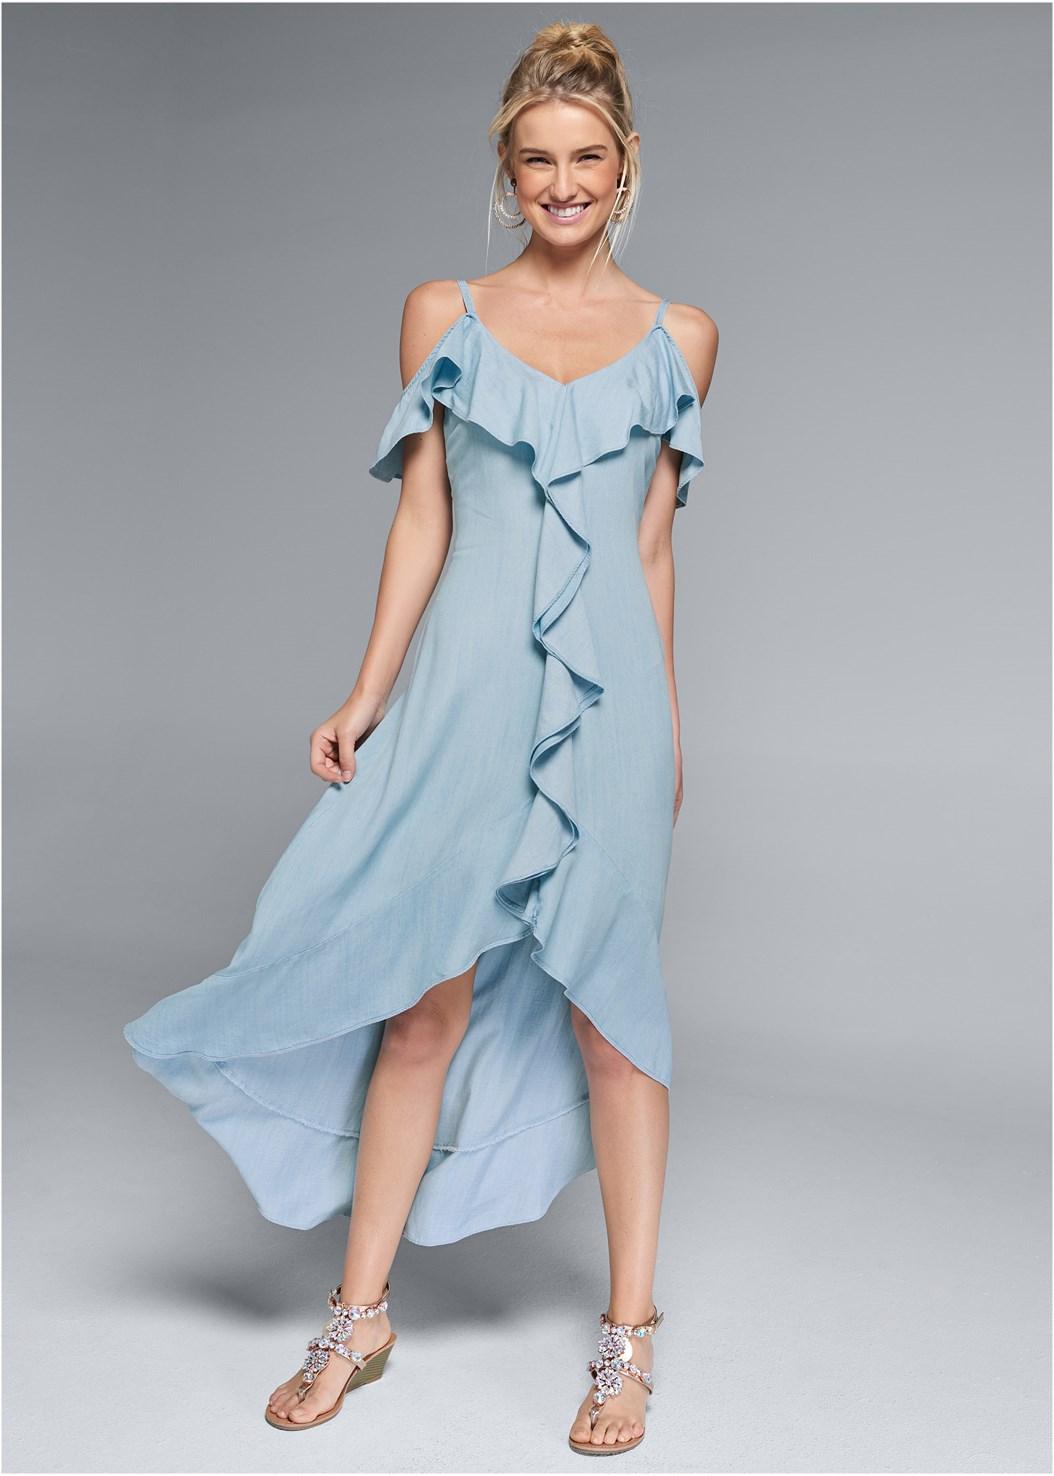 Chambray Dress,Embellished Low Wedges,Beaded Hoop Earrings